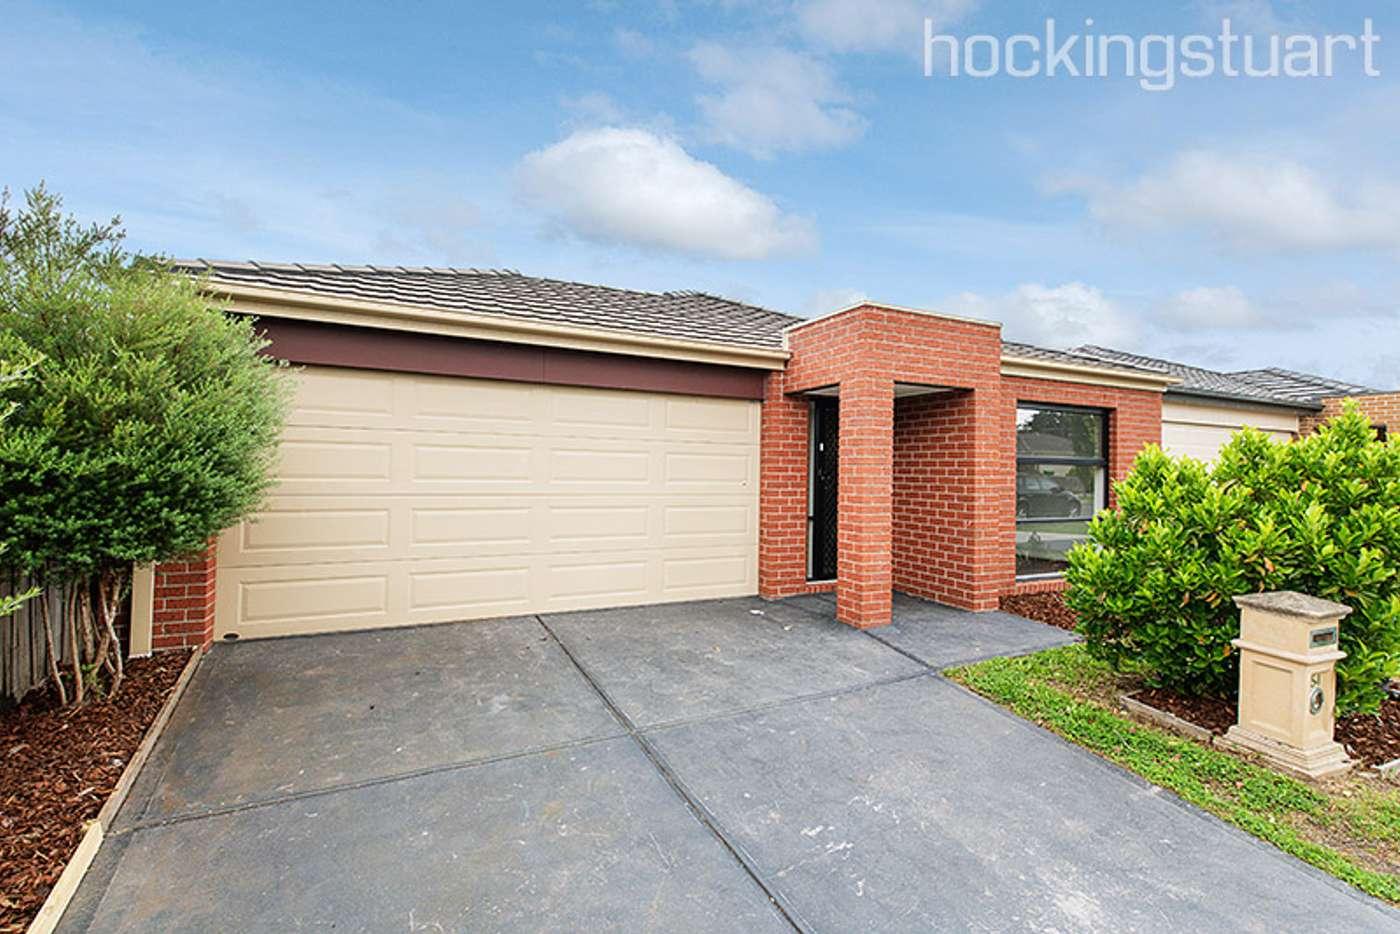 Main view of Homely house listing, 54 Melissa Way, Pakenham VIC 3810